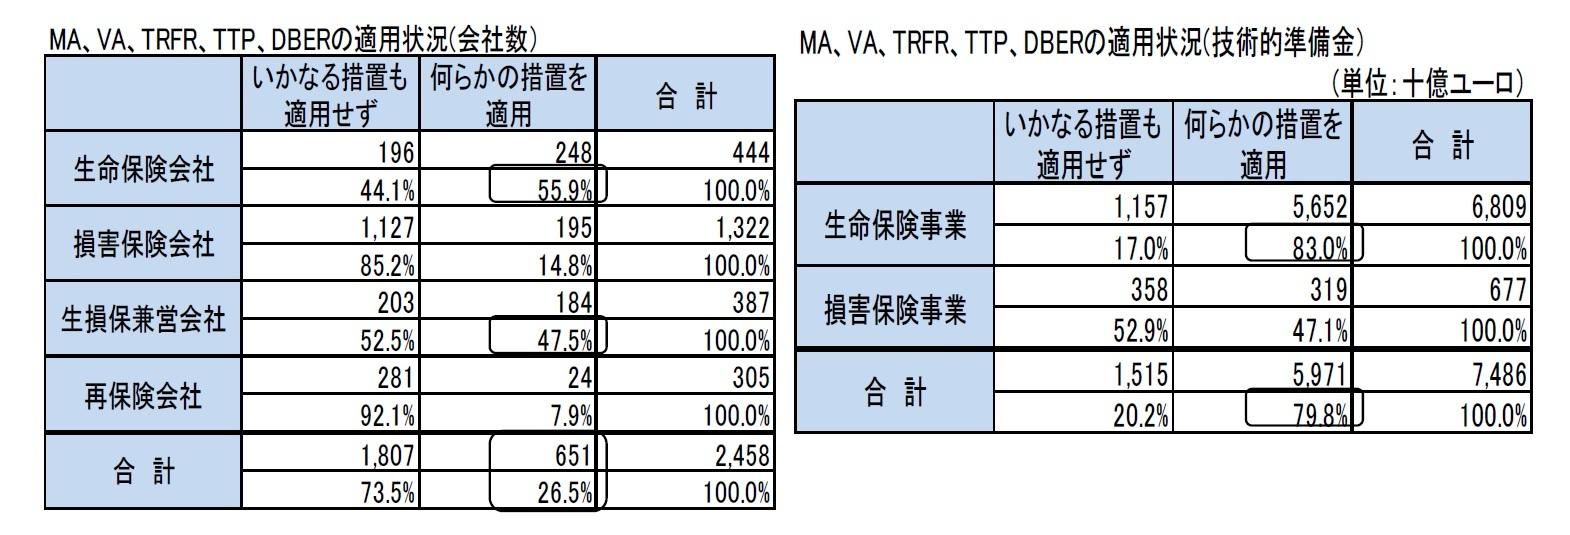 MA、VA、TRFR、TTP、DBERの適用状況(会社数)/MA、VA、TRFR、TTP、DBERの適用状況(技術的準備金)